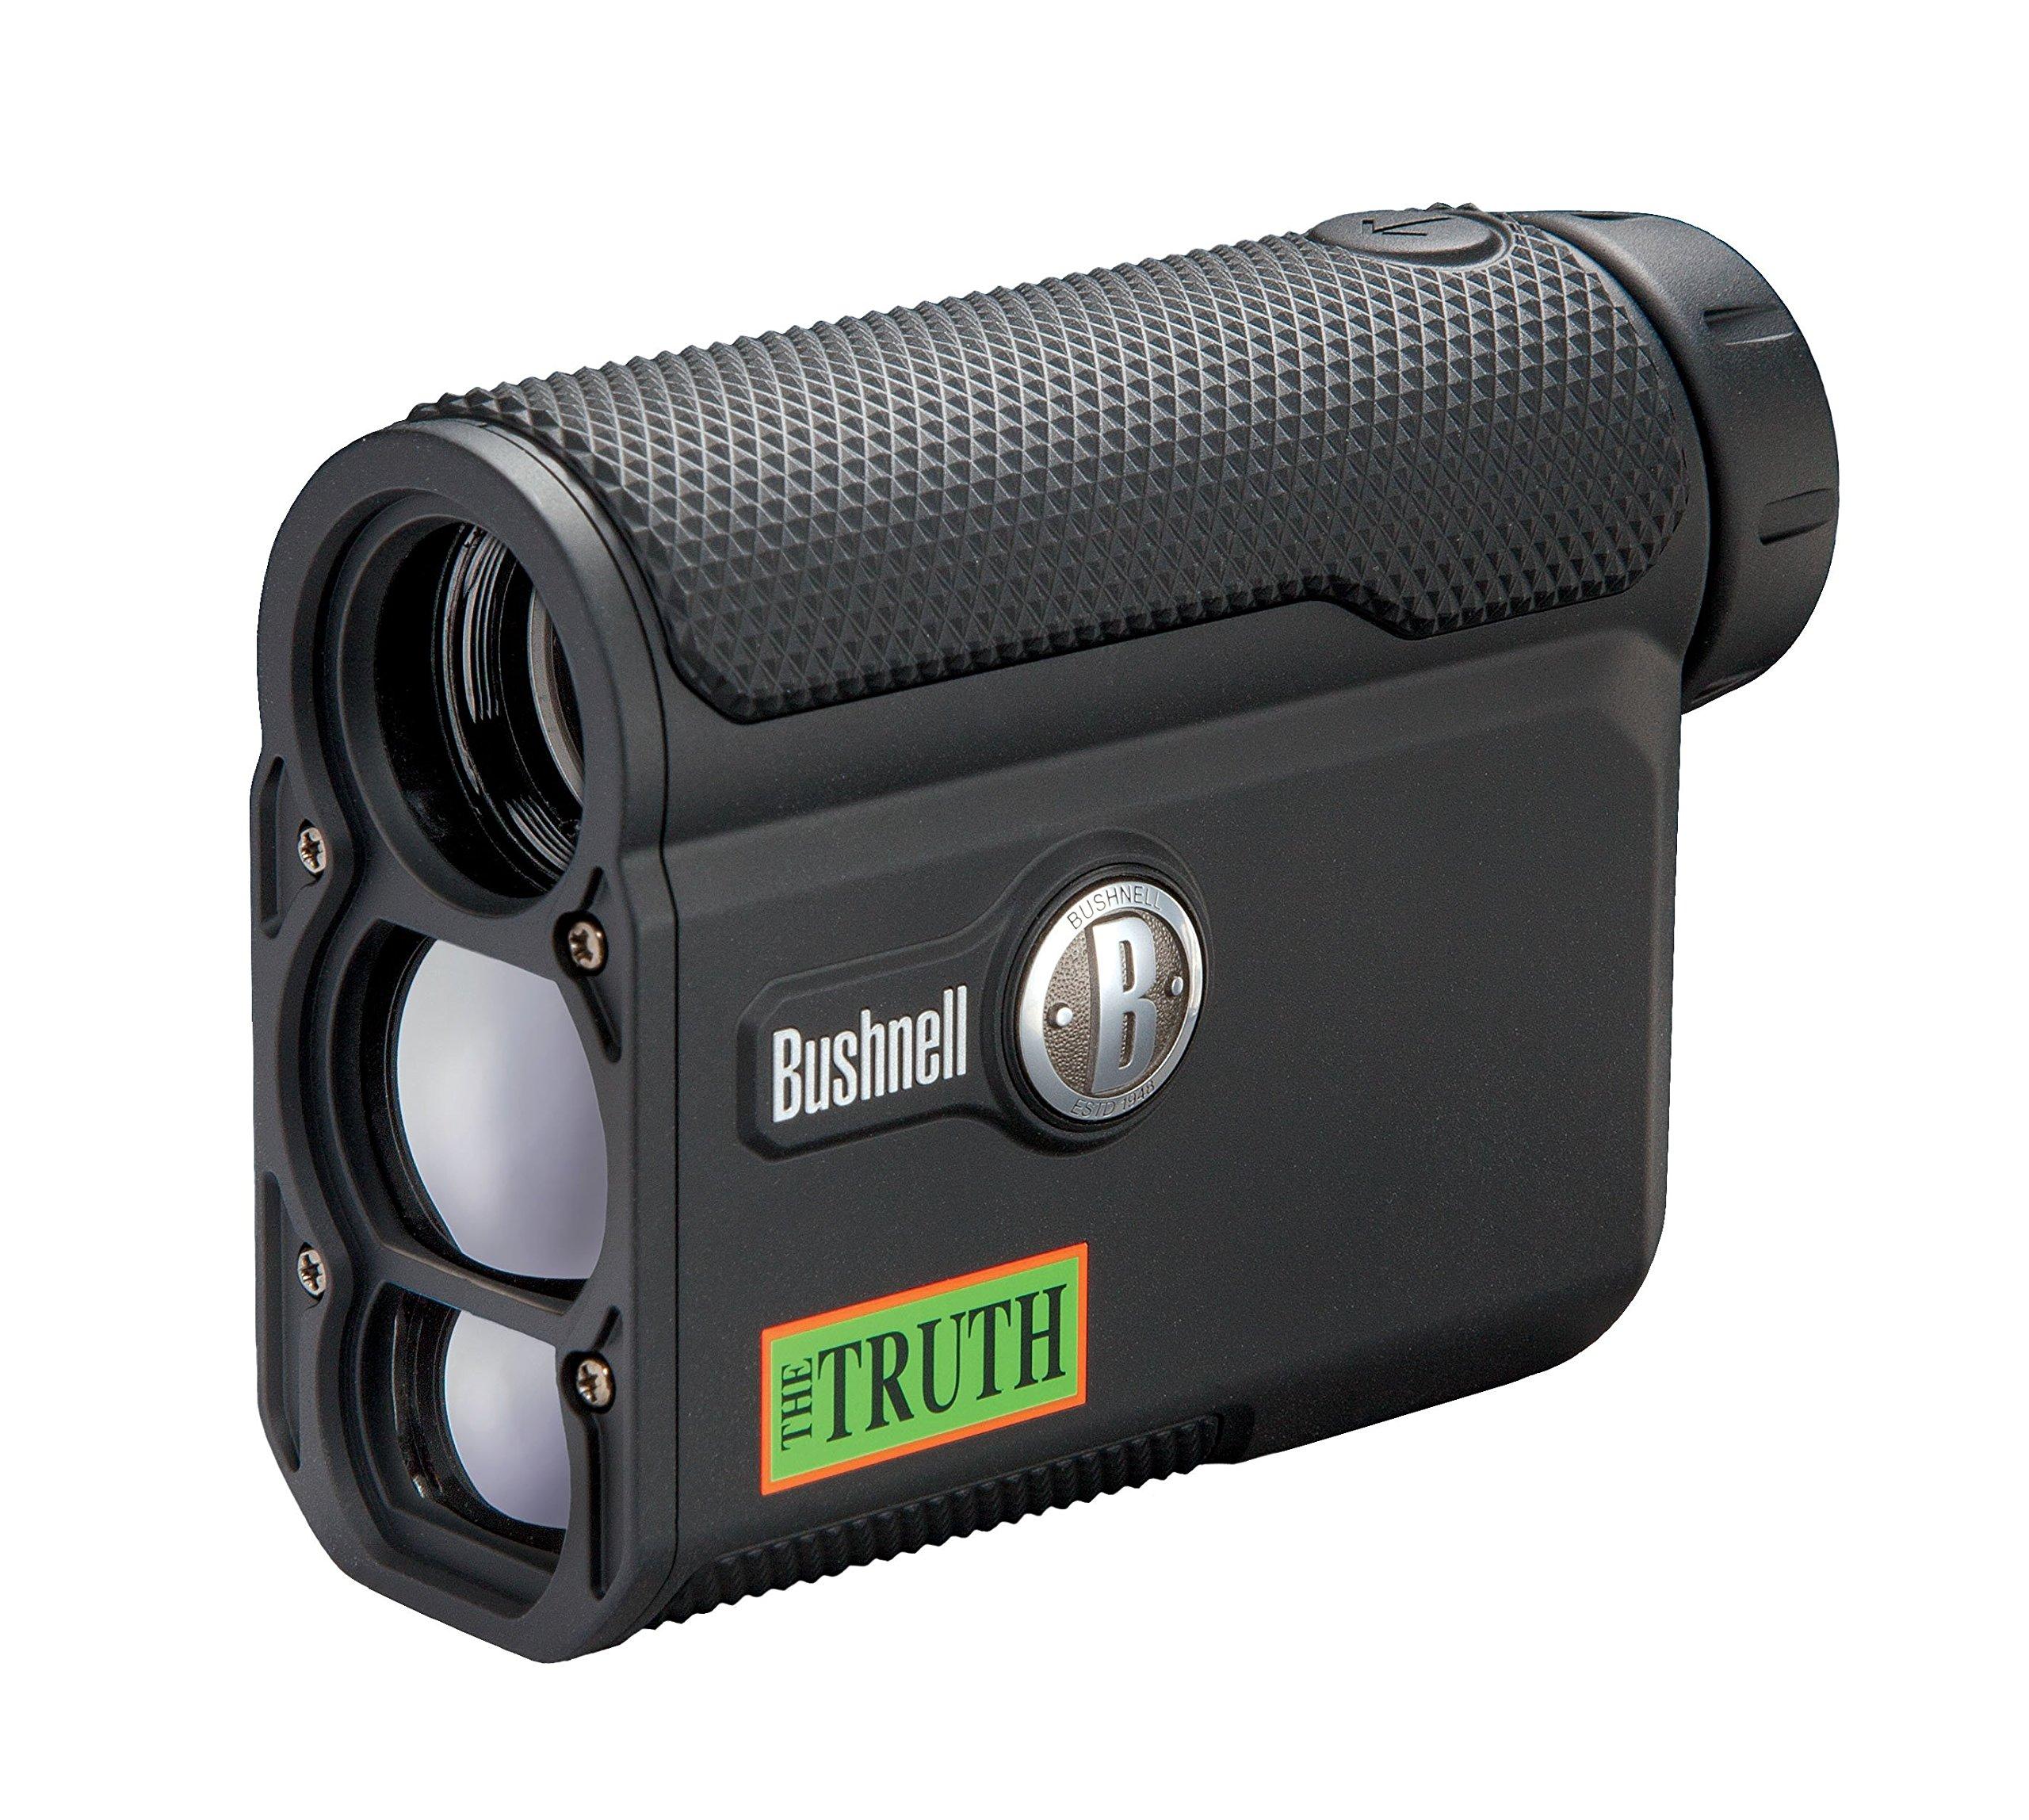 Bushnell Team Primos The Truth ARC 4 x 20mm Bow Mode Laser Rangefinder by Primos Hunting